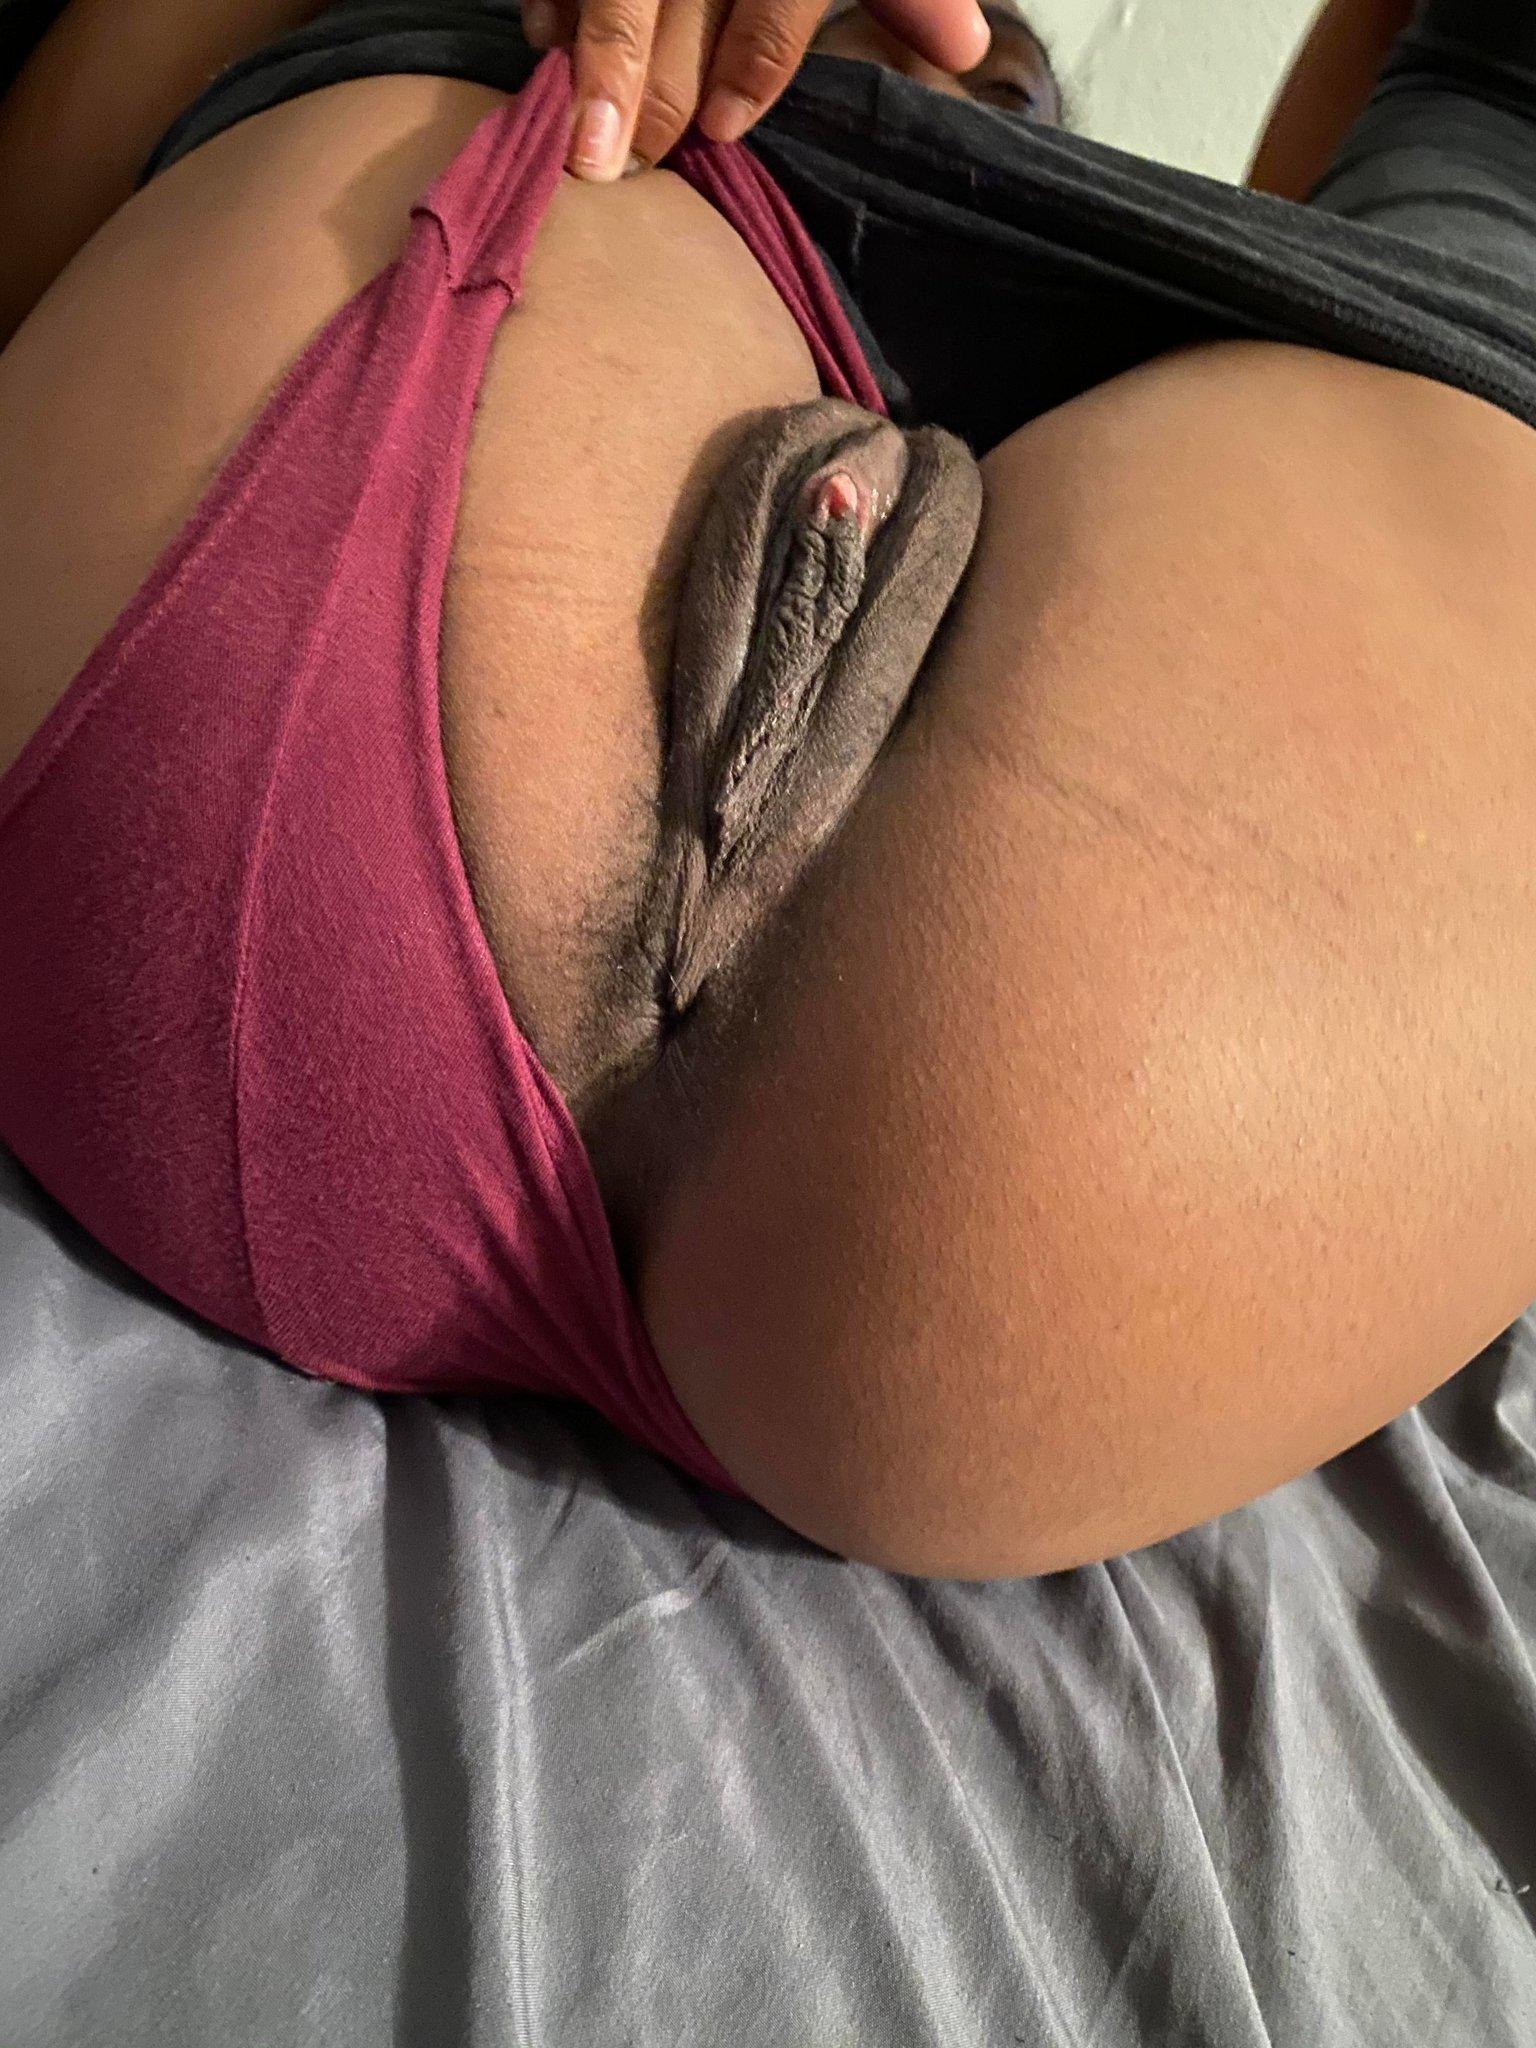 Fotos XXX Conchas de mamis calientes